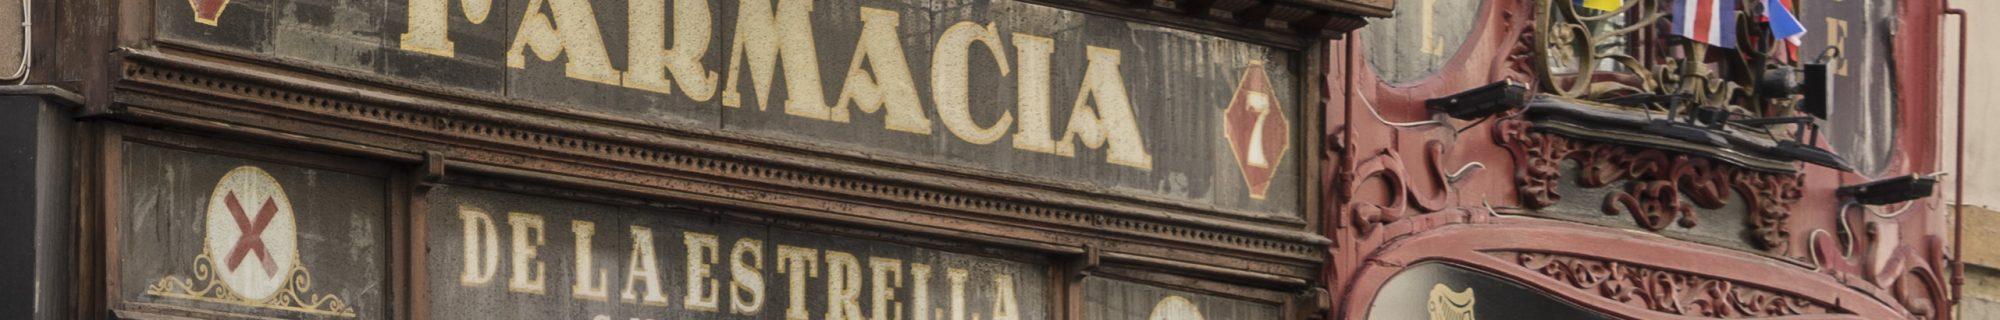 farmaciadelaestrella